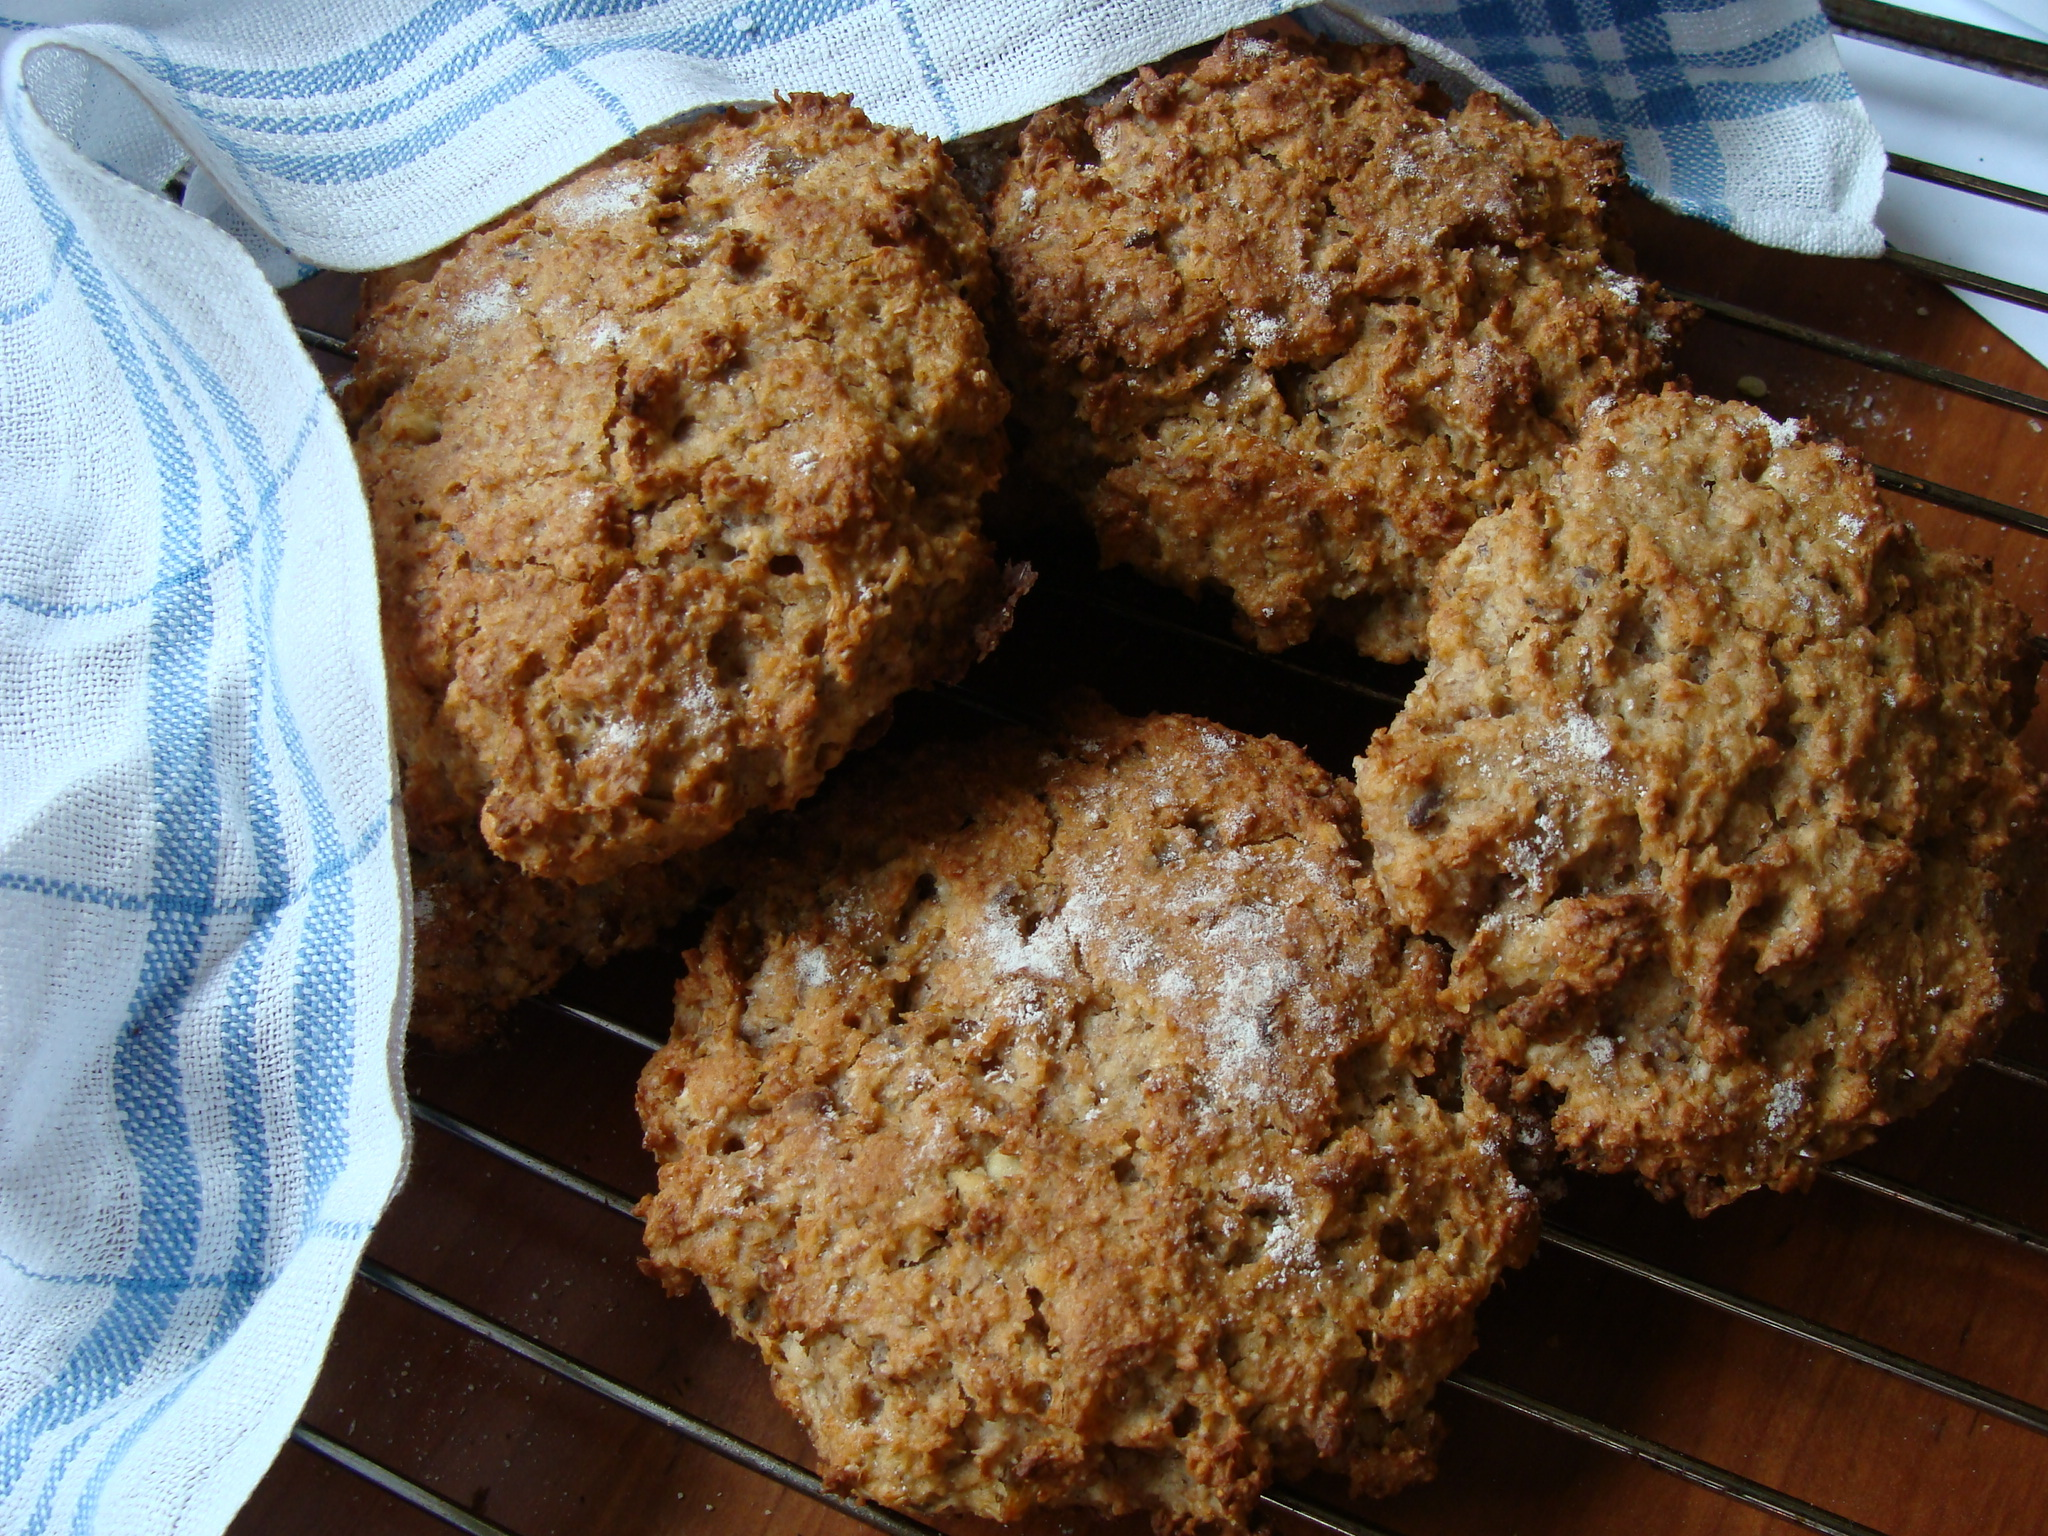 Malins frukostbröd